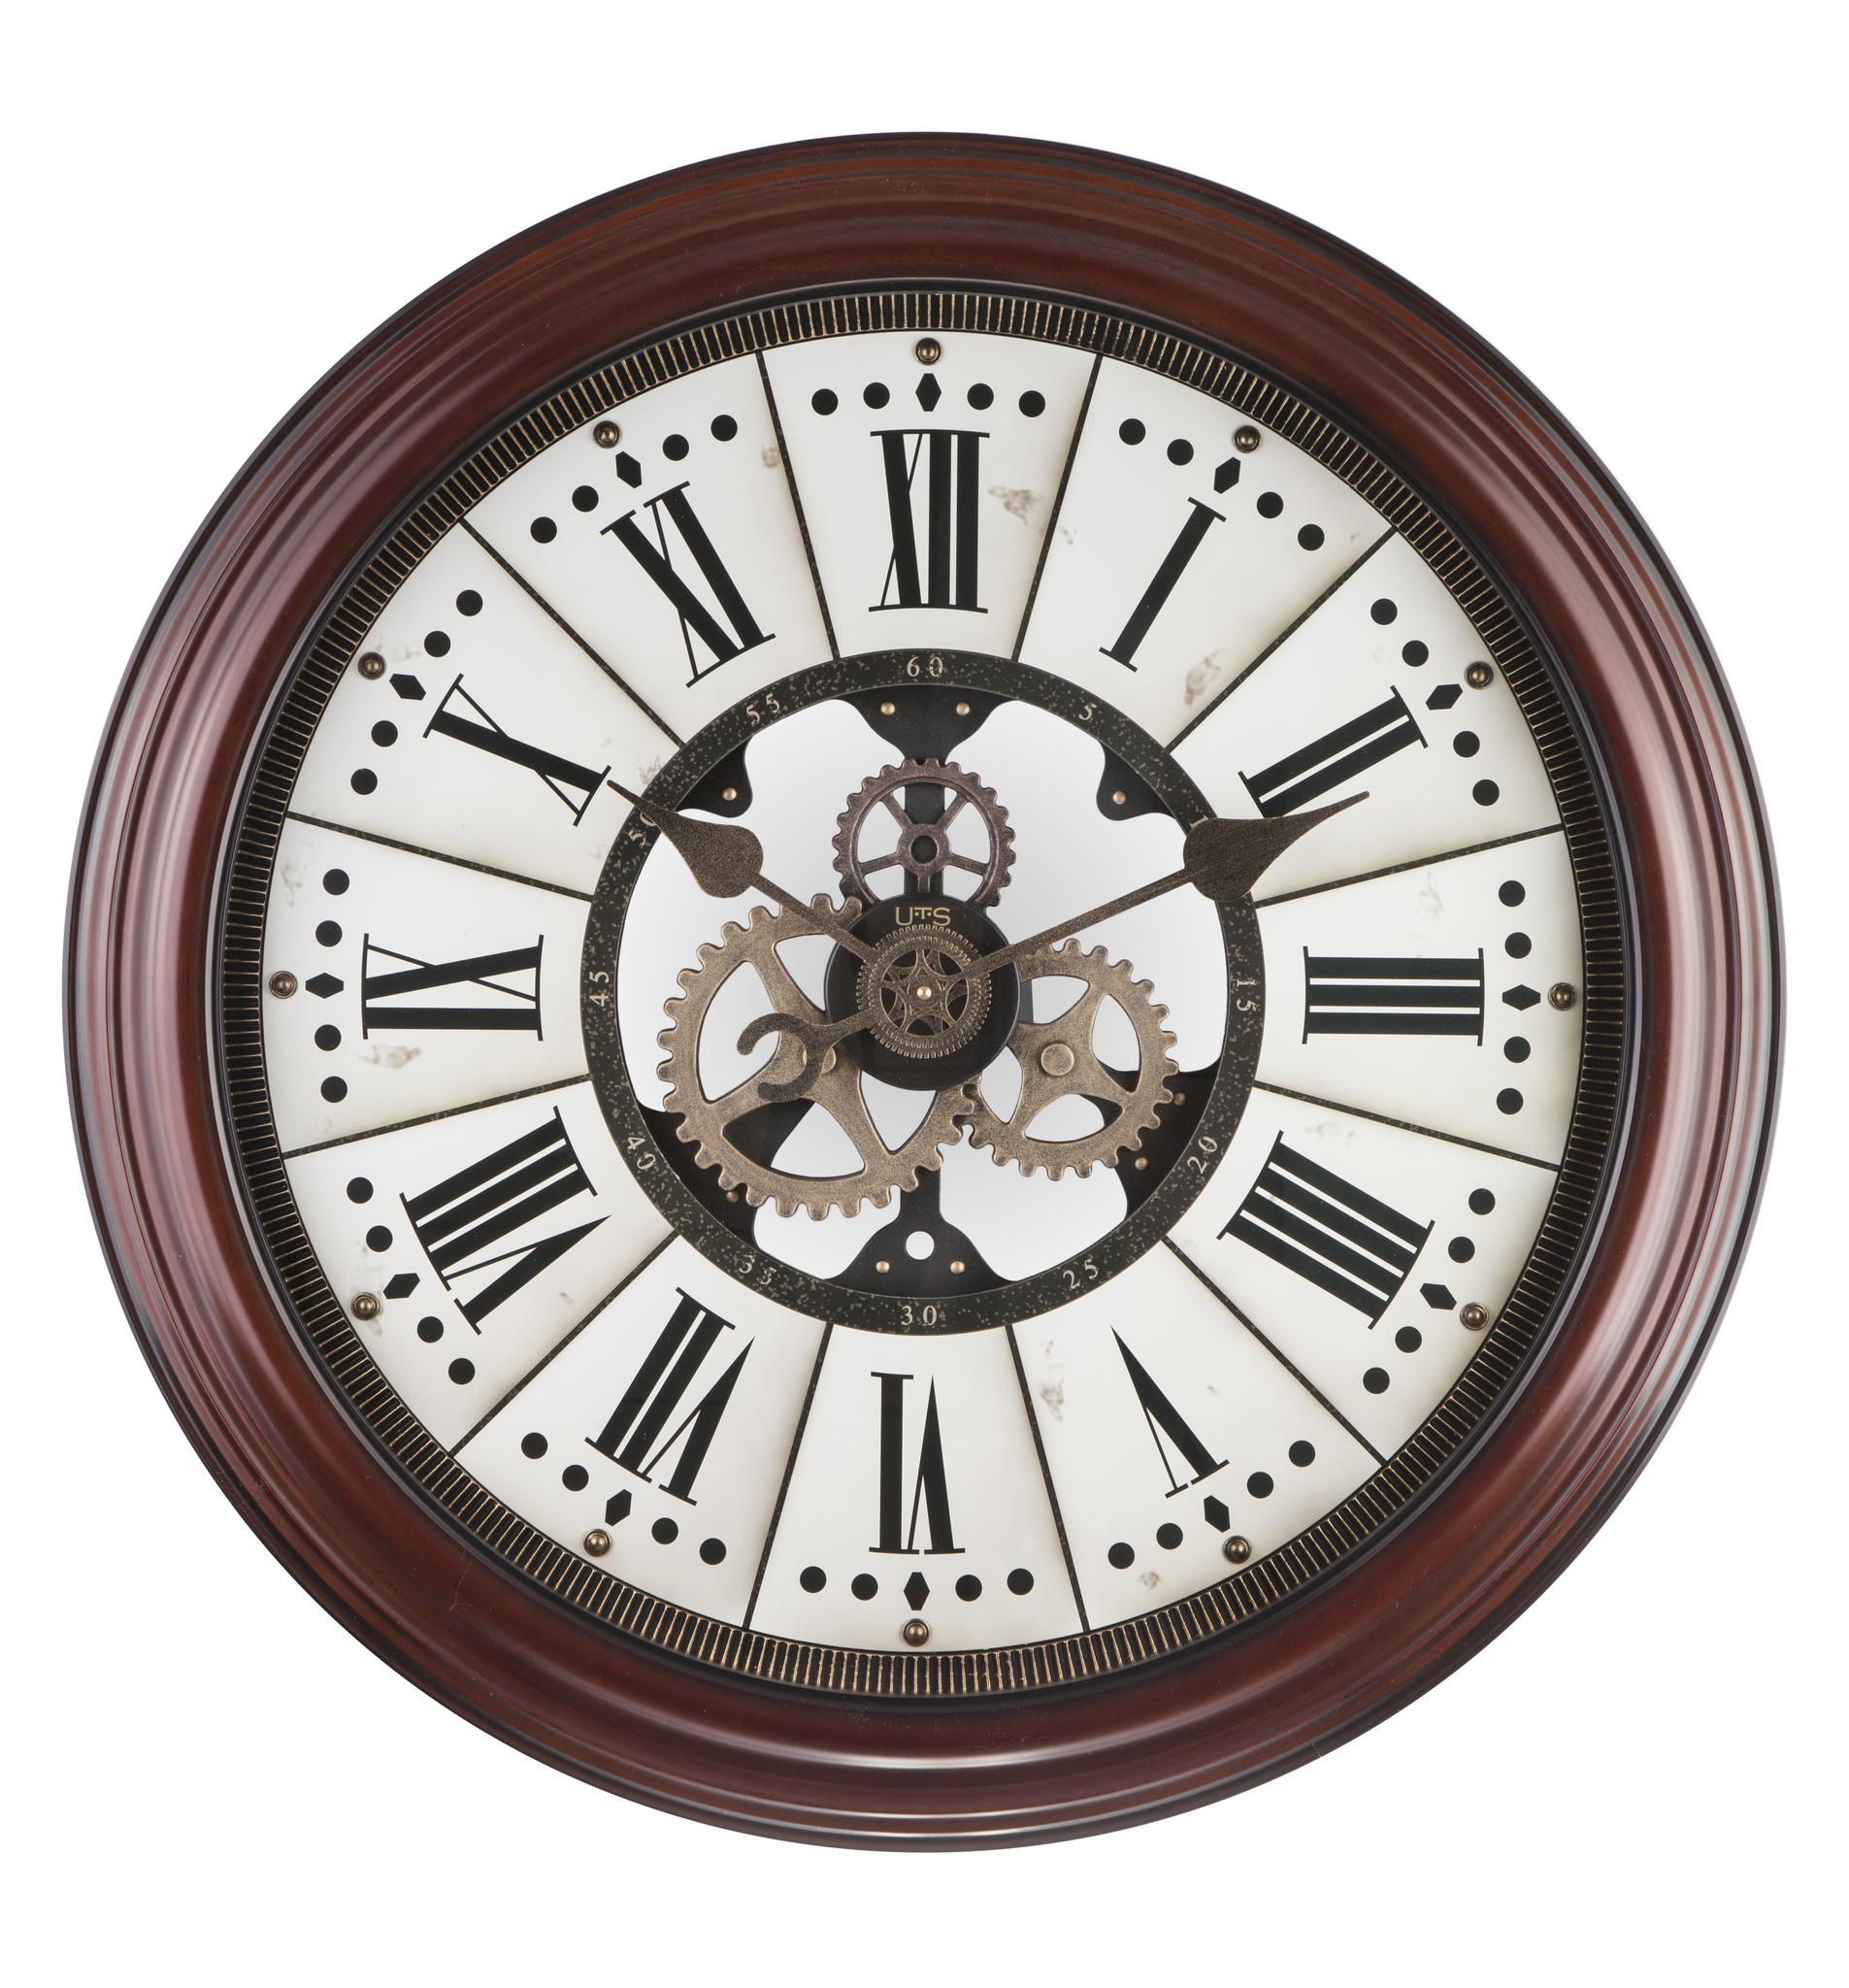 Часы настенные Часы настенные Tomas Stern 9028 chasy-nastennye-tomas-stern-9028-germaniya.jpg